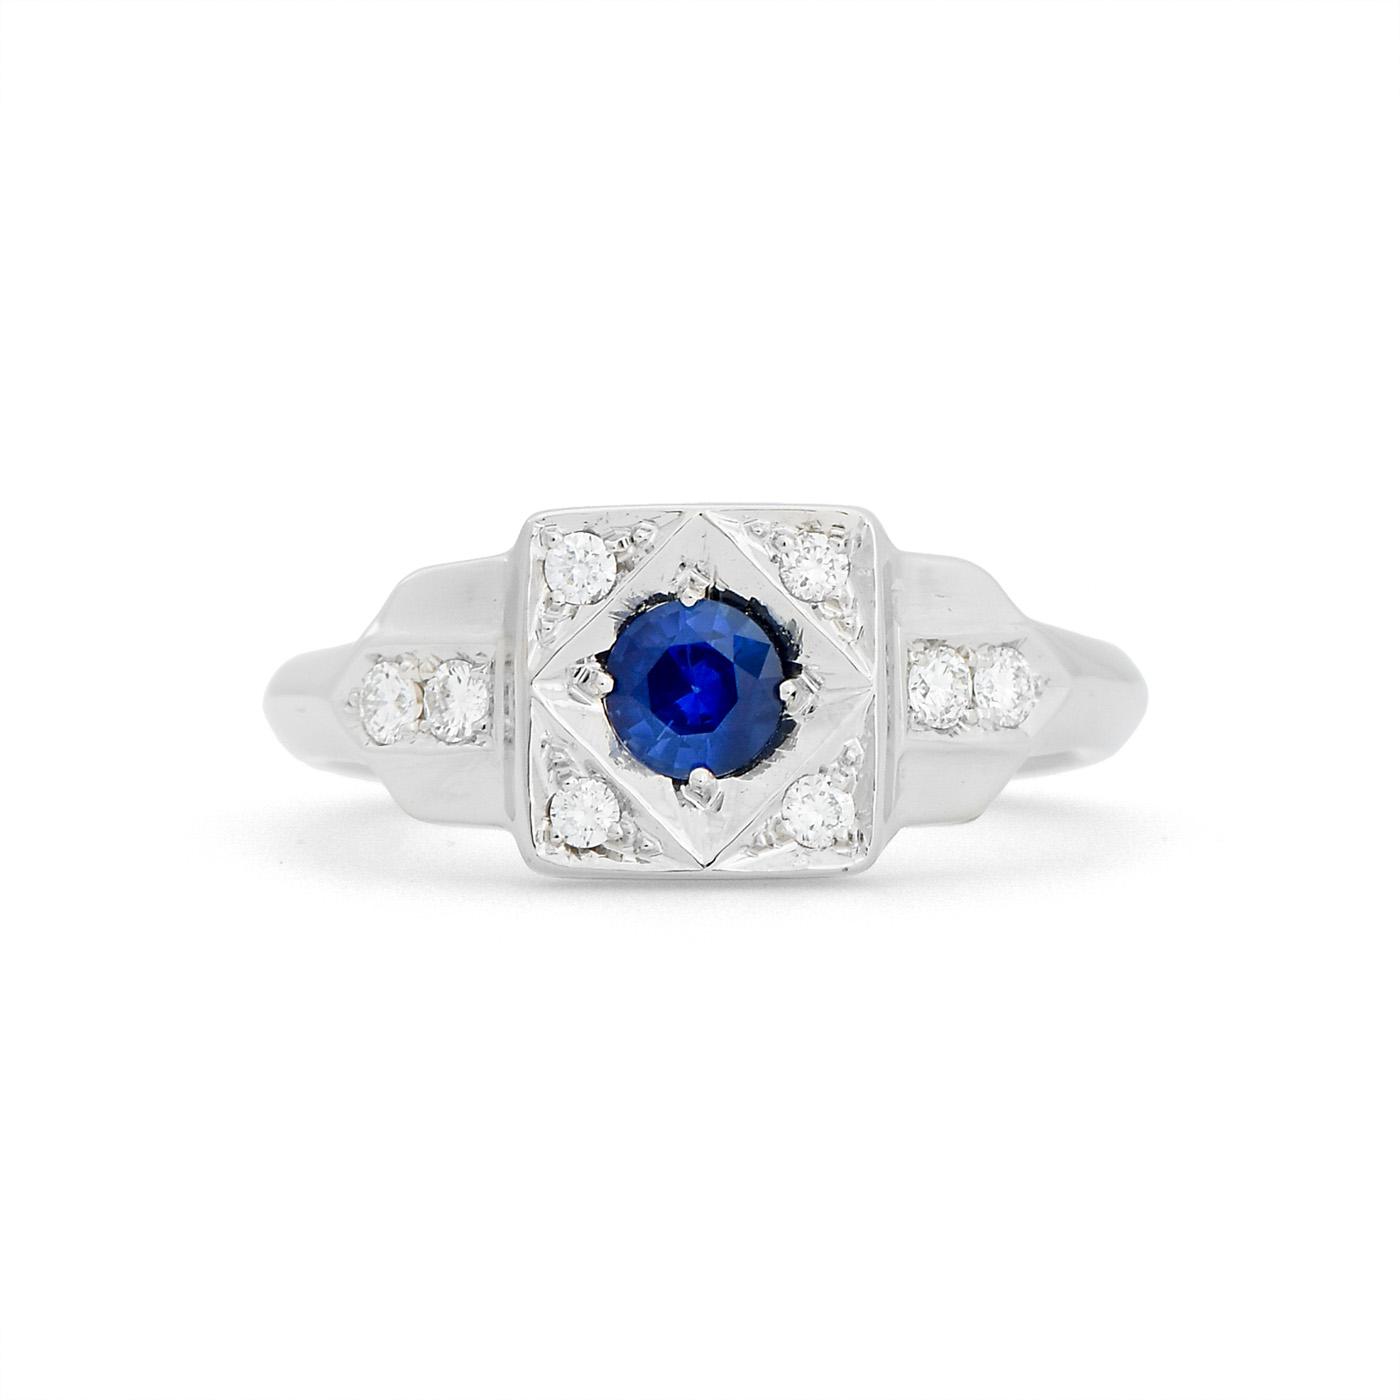 Art deco diamond ring wr0326 dejonghe original jewelry for Sapphire studios jewelry reviews